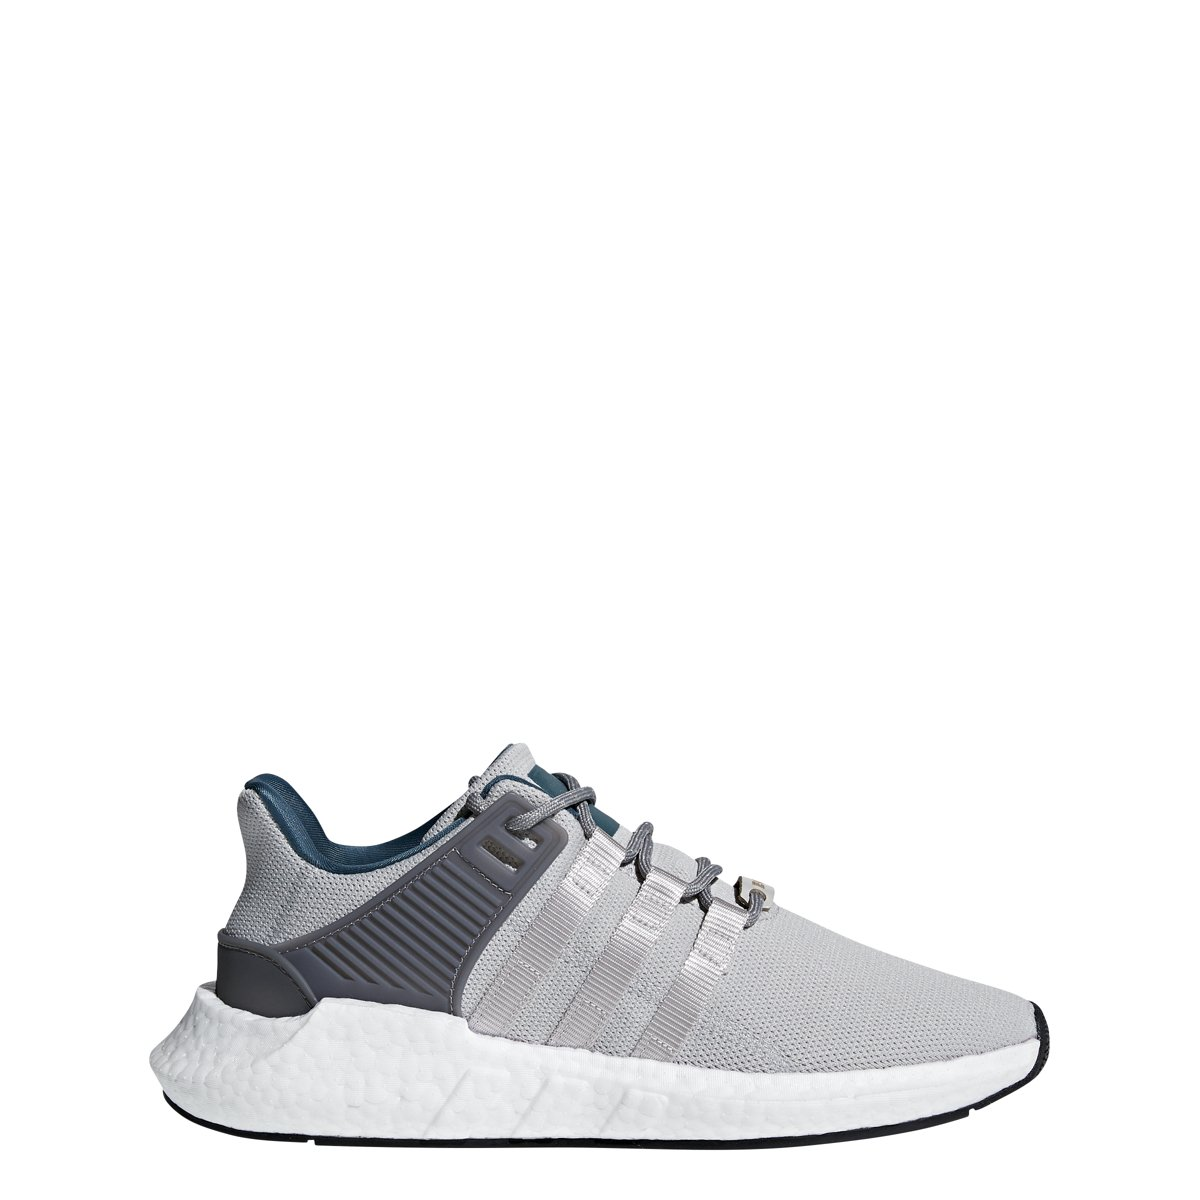 adidas Men's EQT Cushion ADV Originals Training Shoe B077ZDZZDR 10 D(M) US|Gray Two, Gray Two, Gray Three